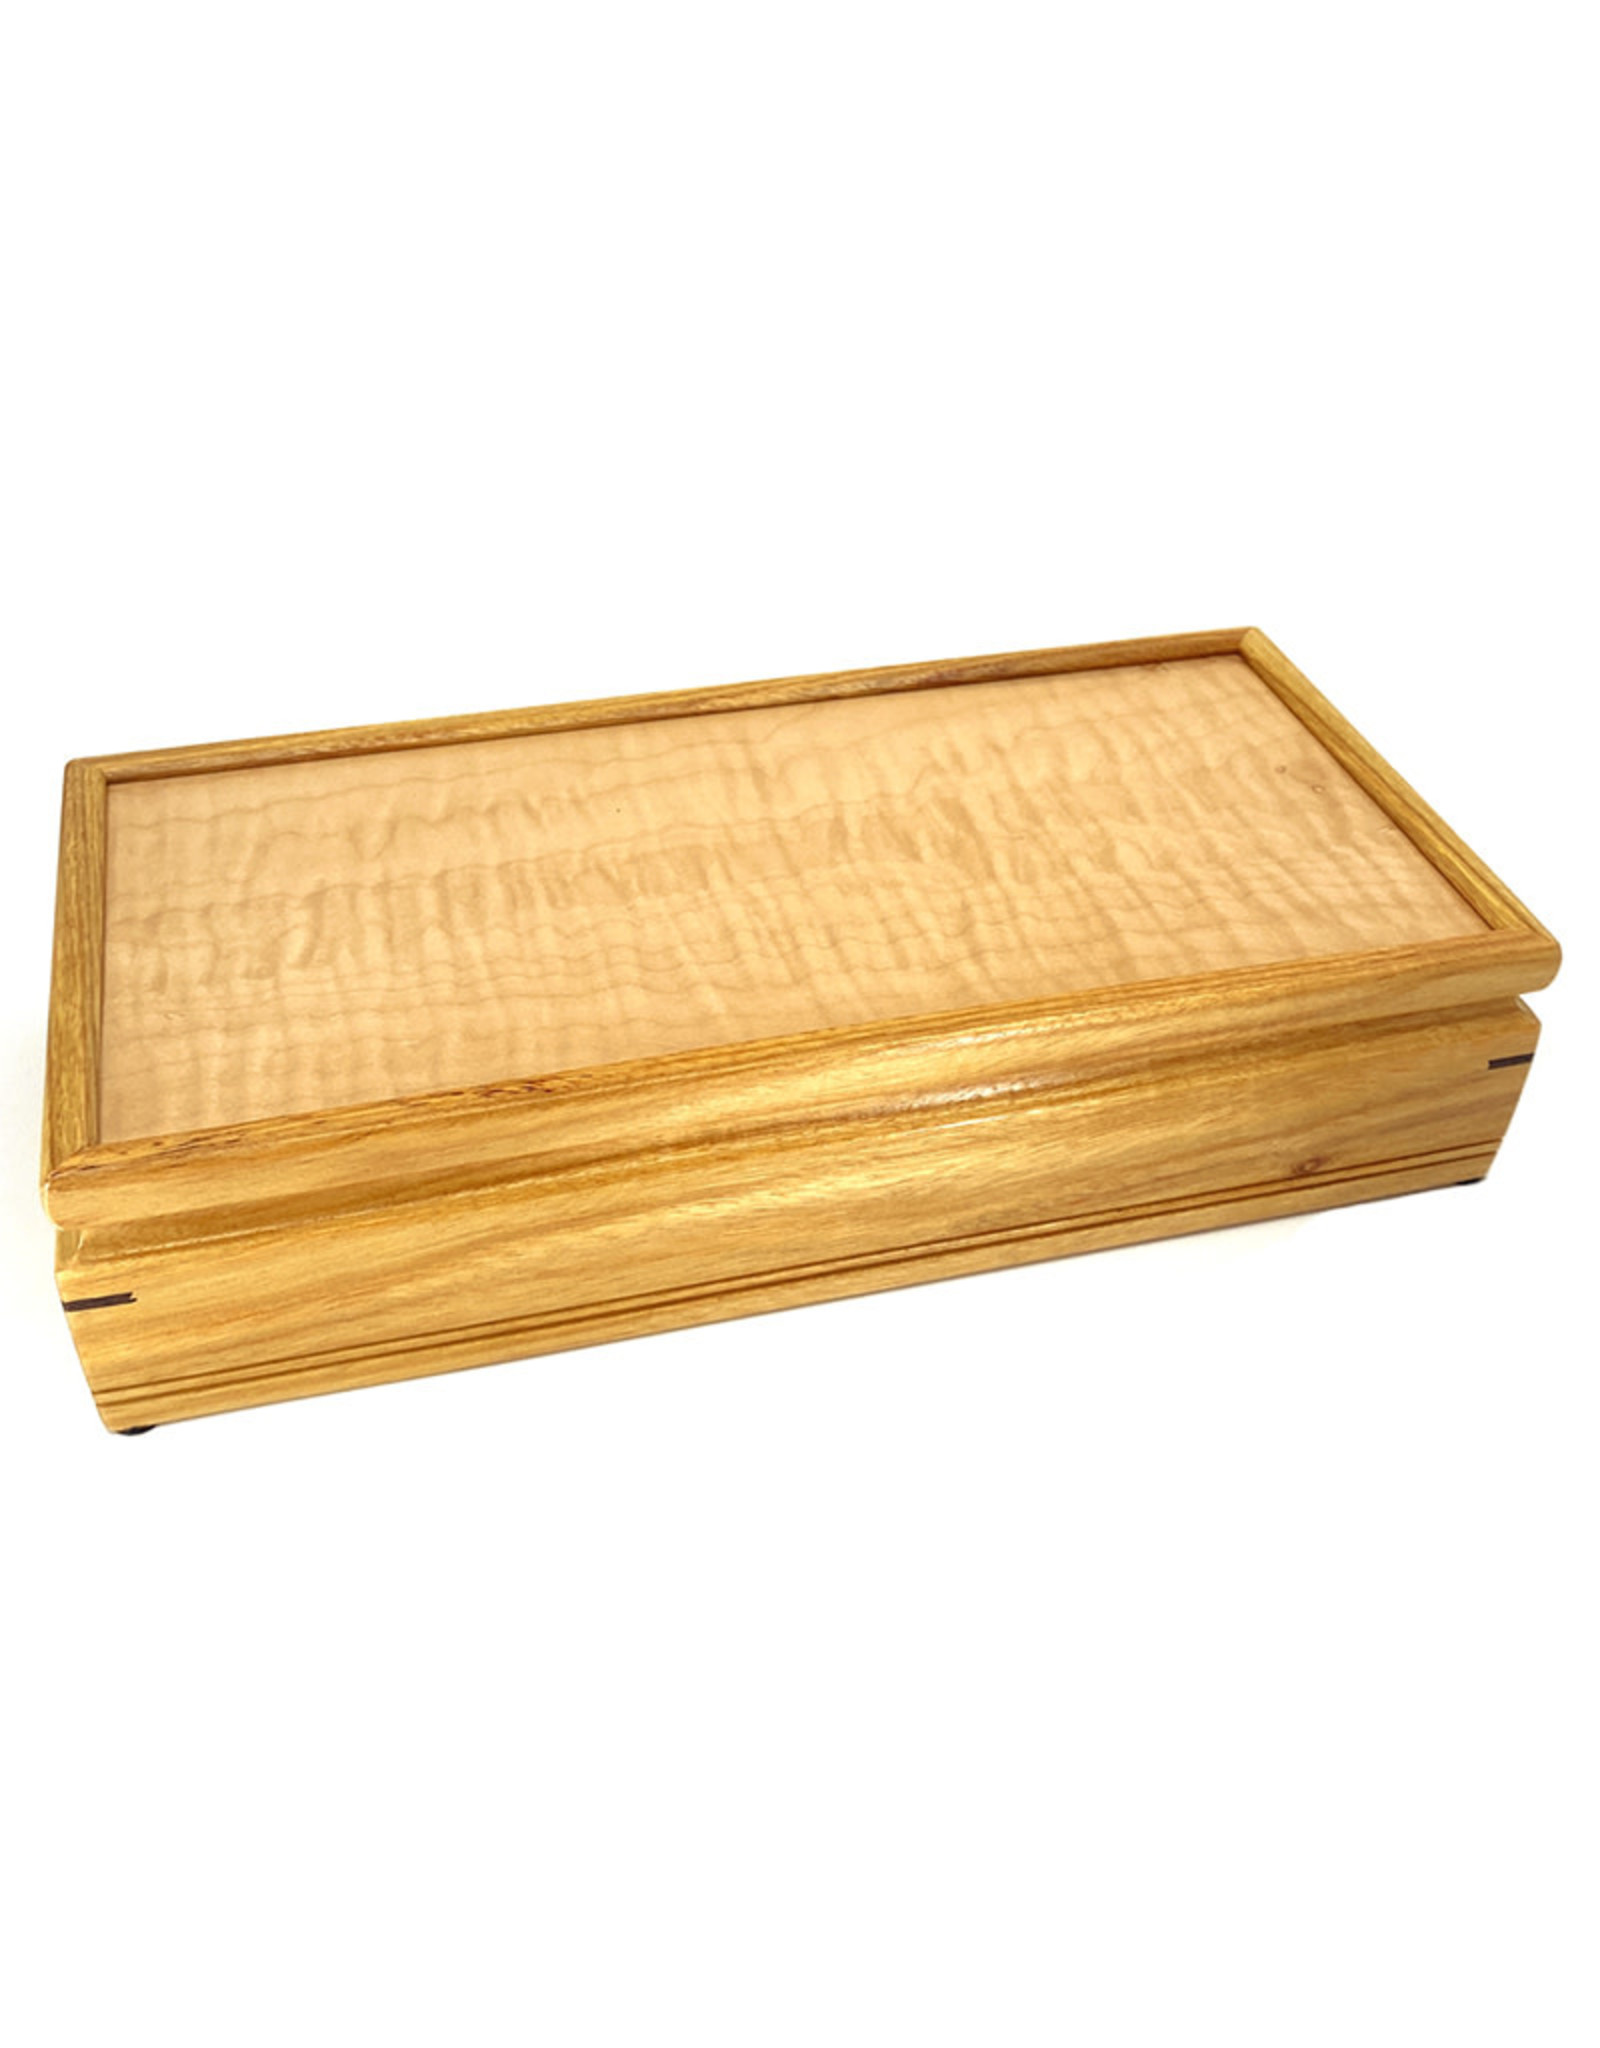 MIKUTOWSKI WOODWORKING MAPLE & CANARYWOOD SENTINEL BOX